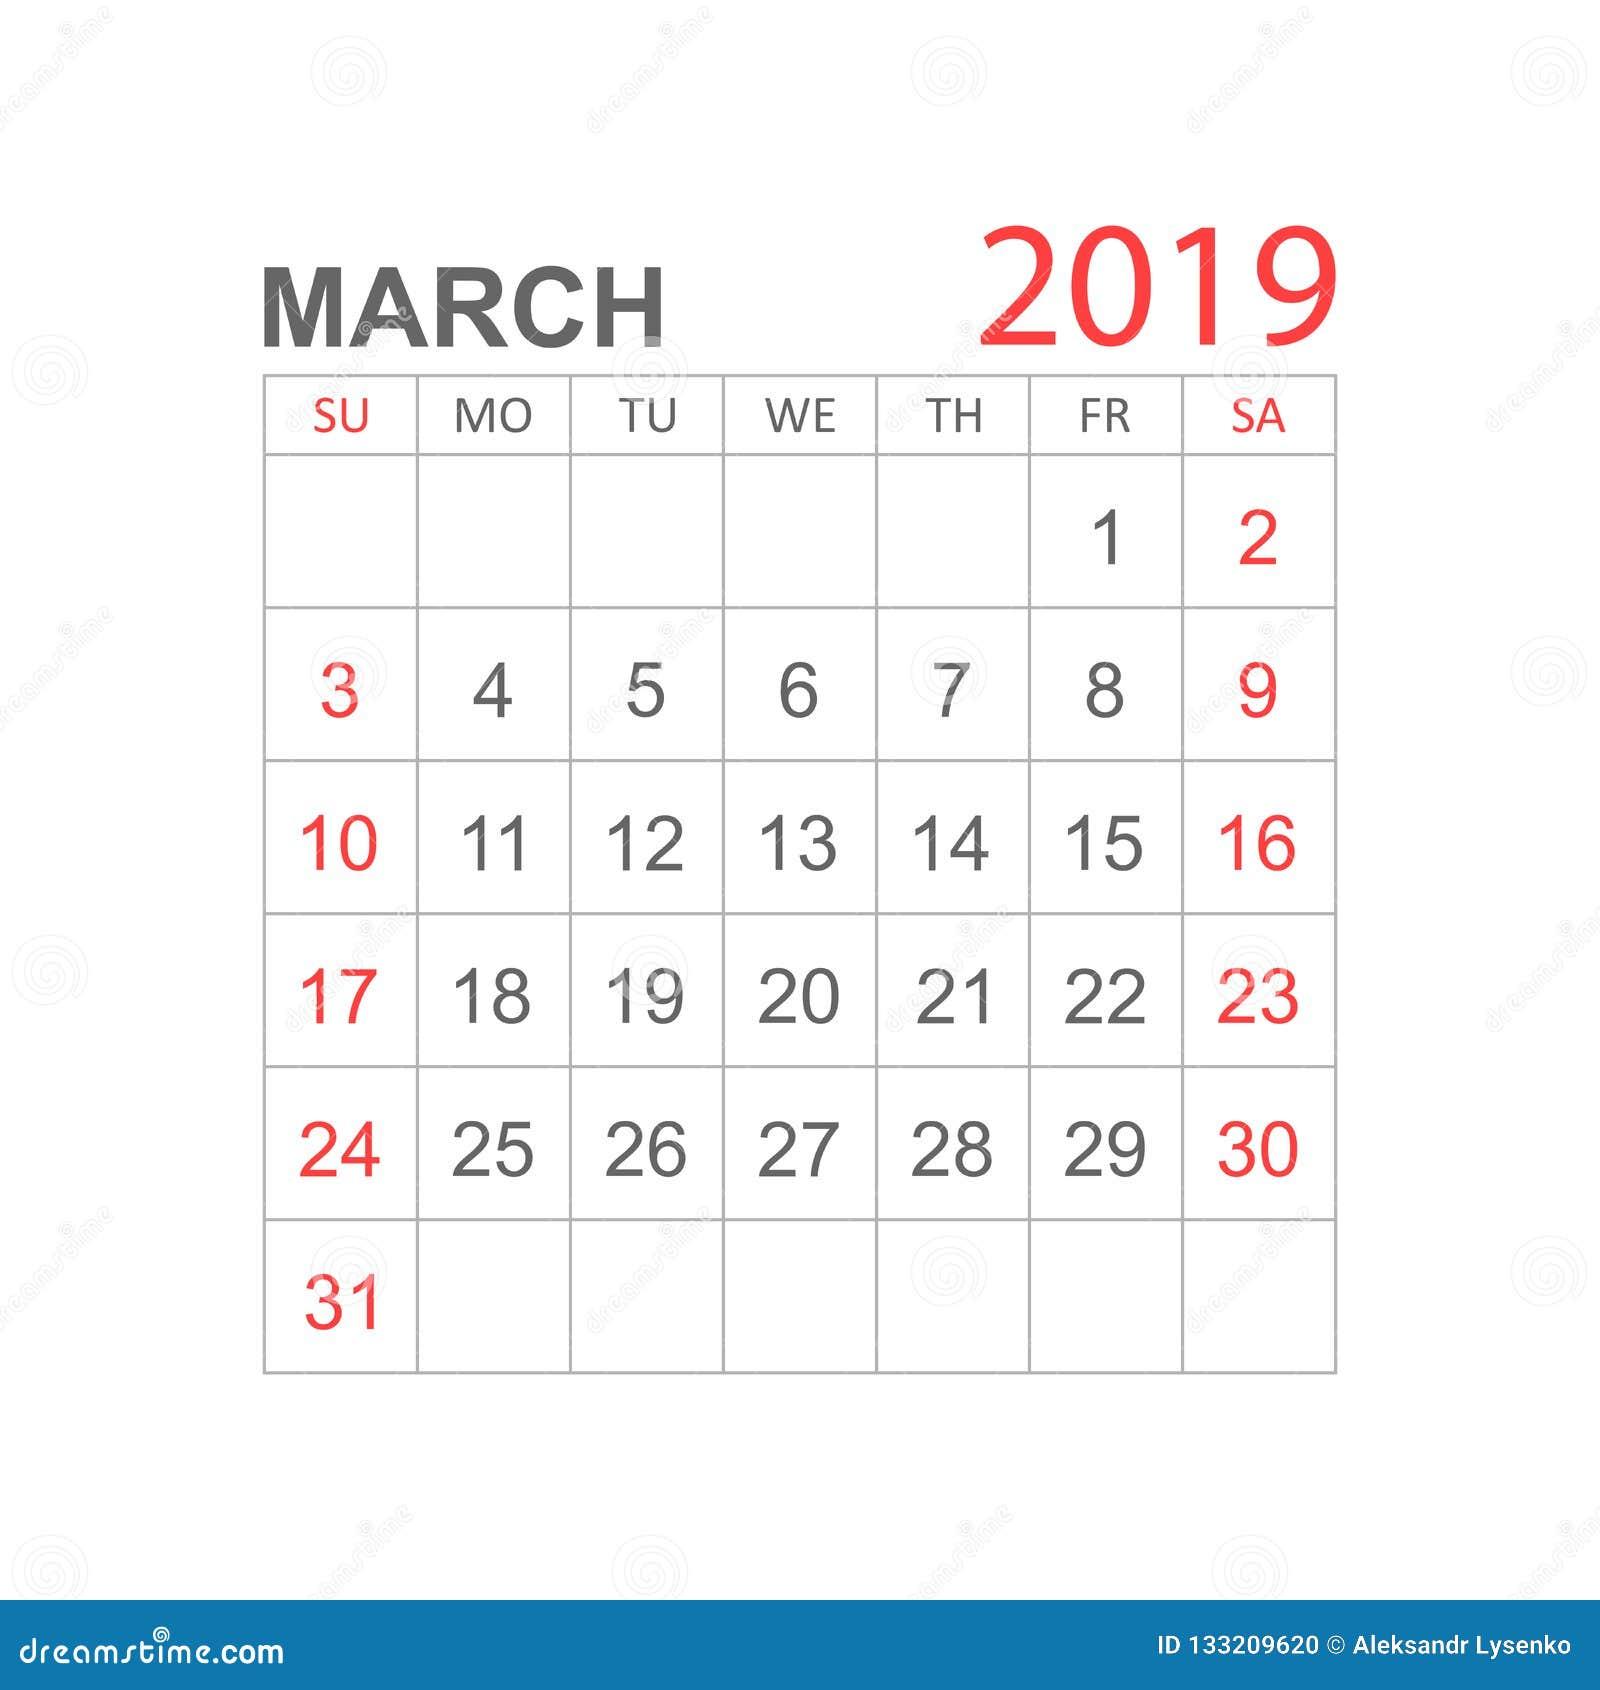 Calendar March 2019 Year In Simple Style  Calendar Planner Design